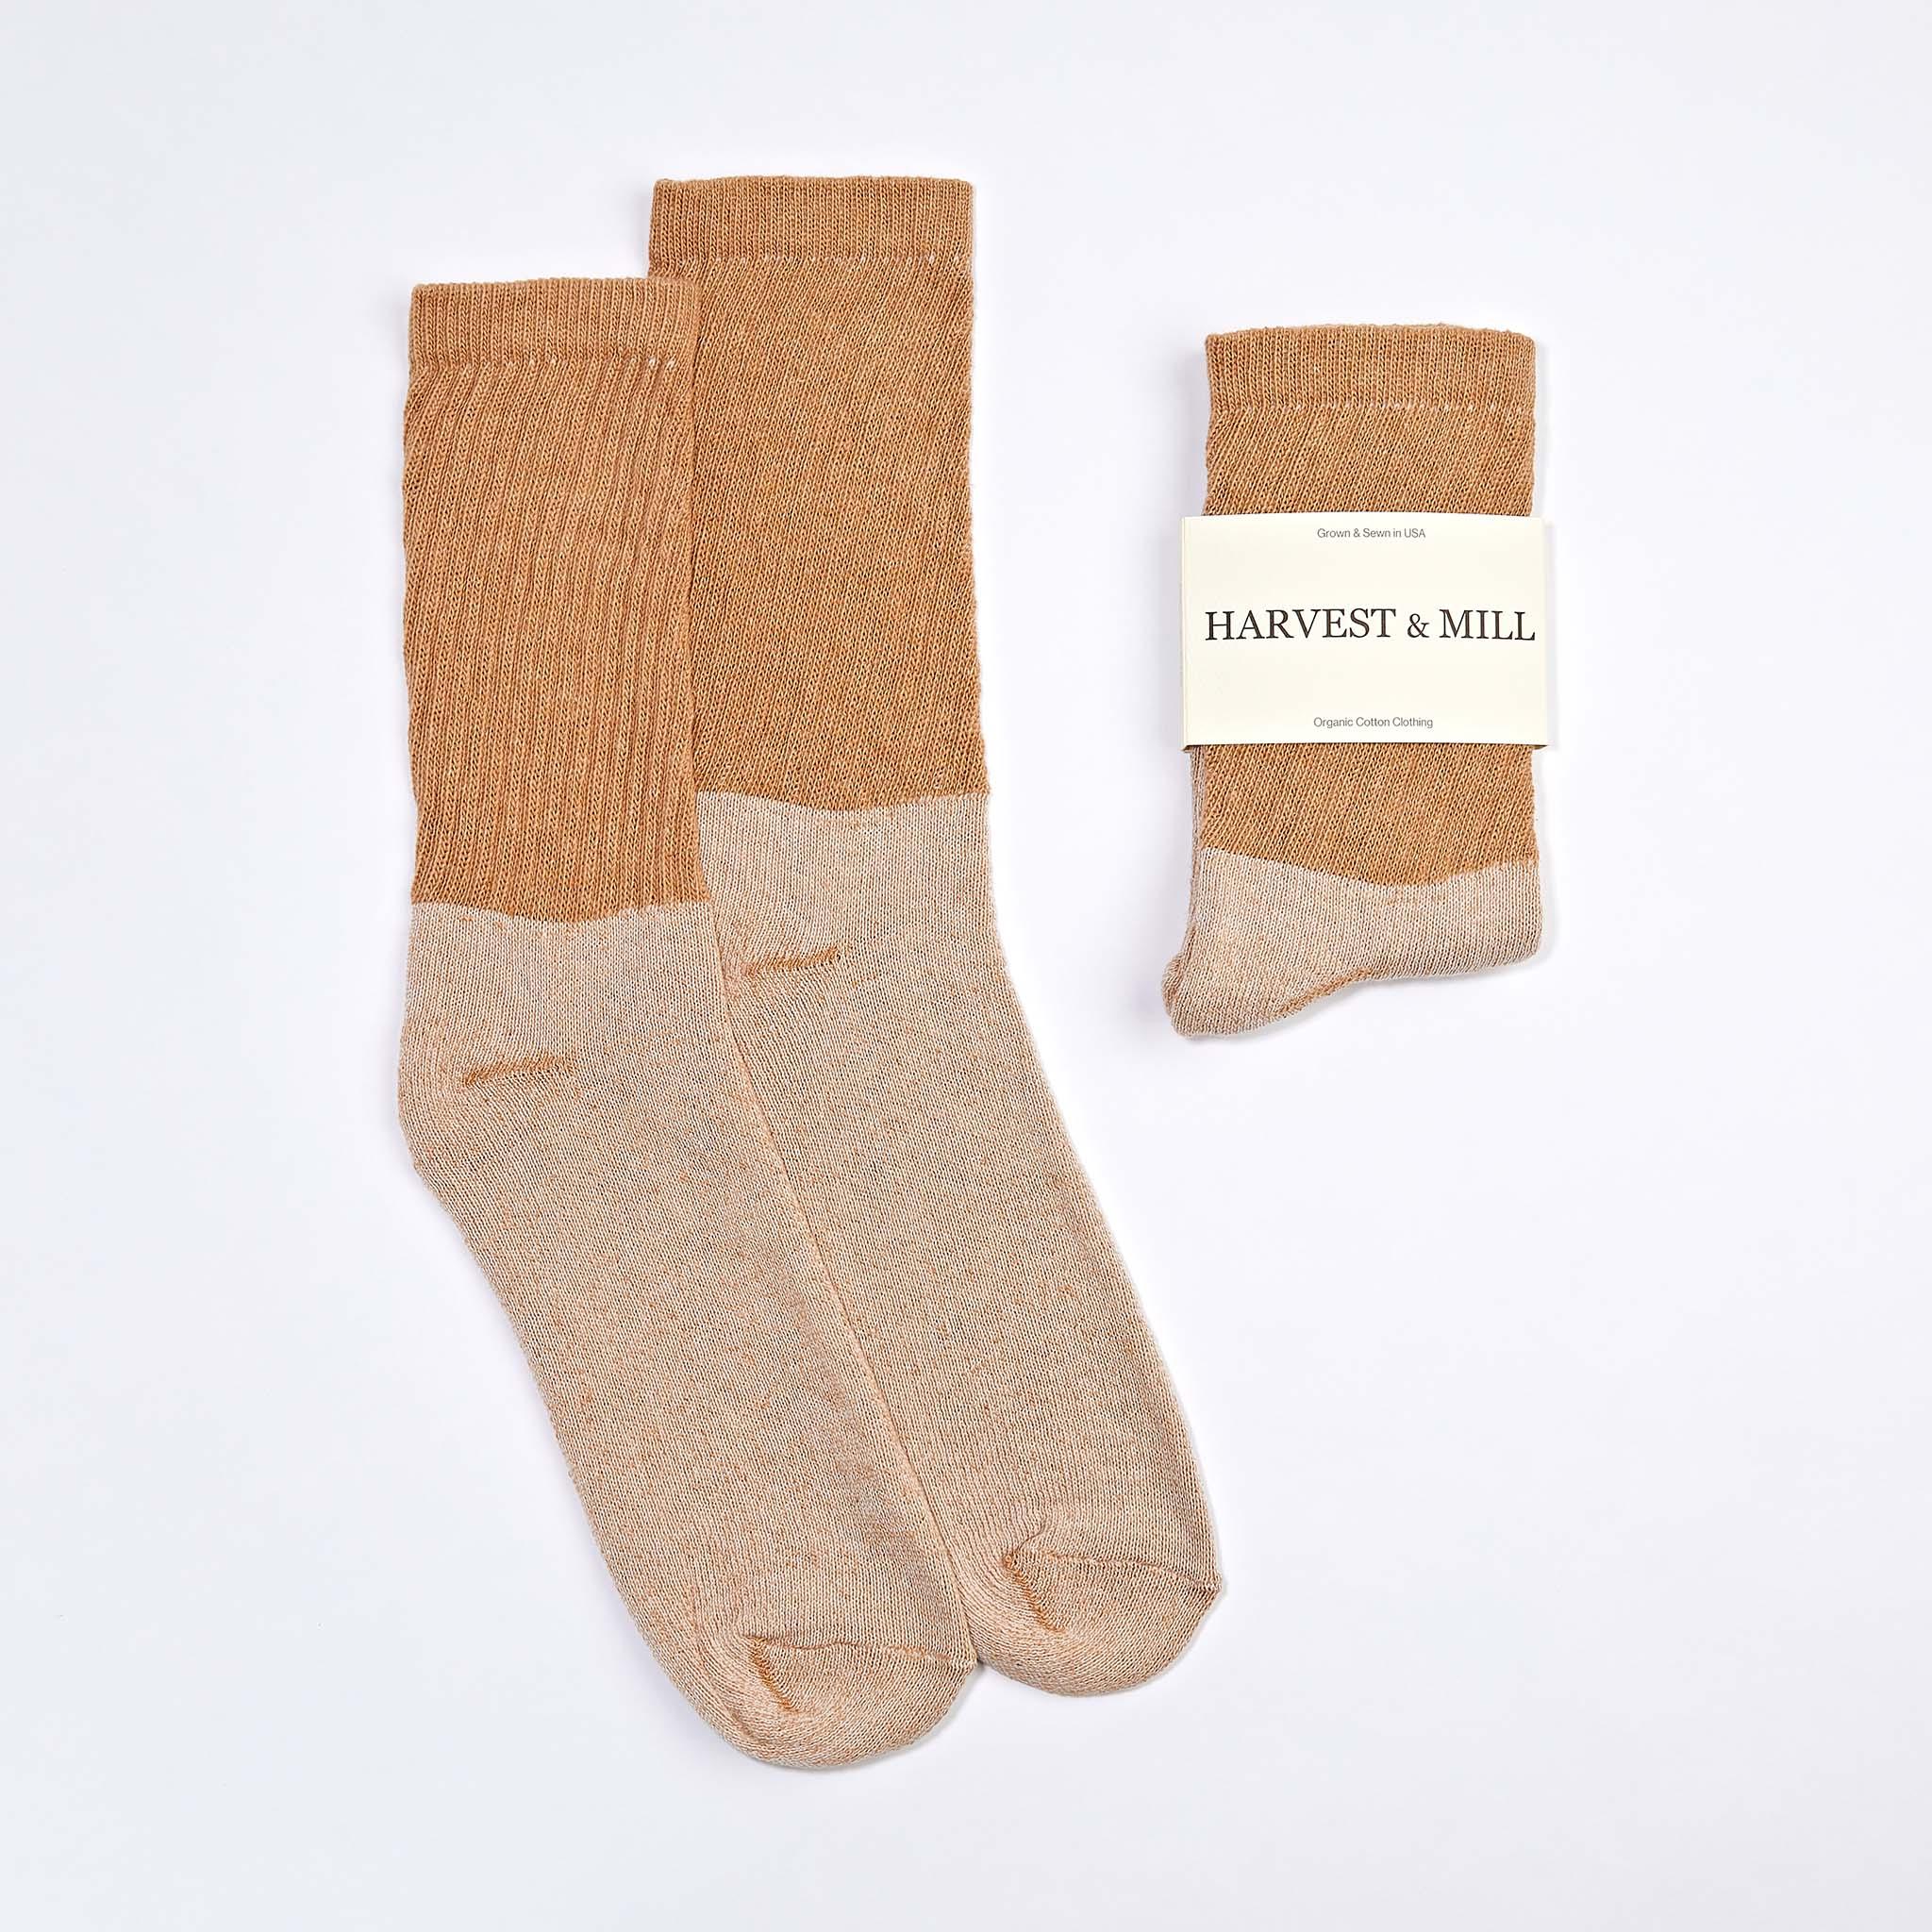 Organic Cotton Socks Brown Crew $10